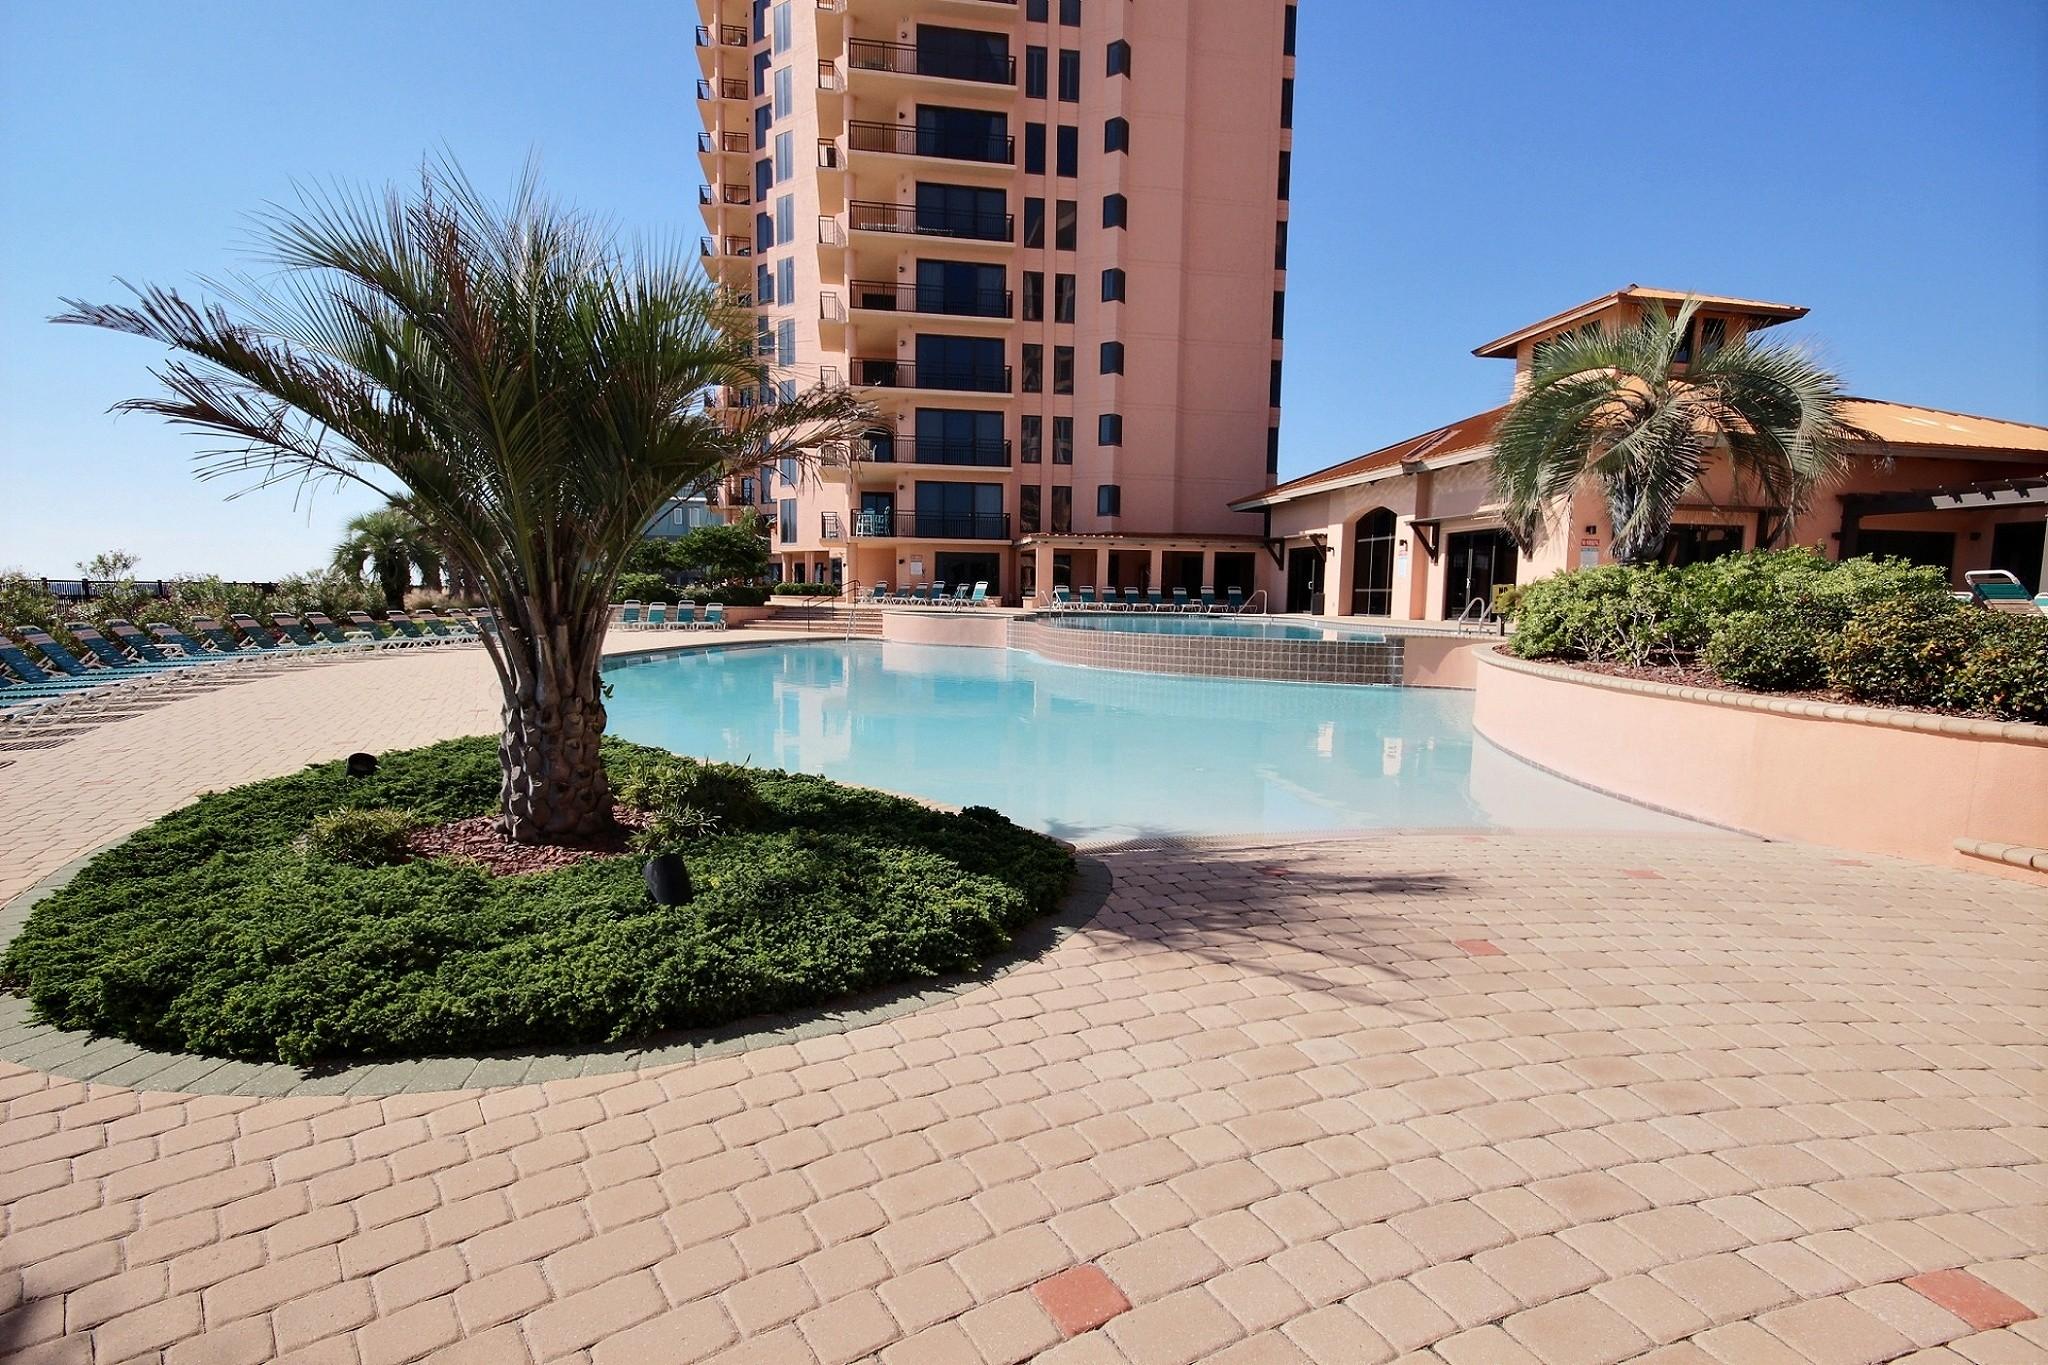 Beach Resort Rentals  Seachase 905C  Luxury Coastal